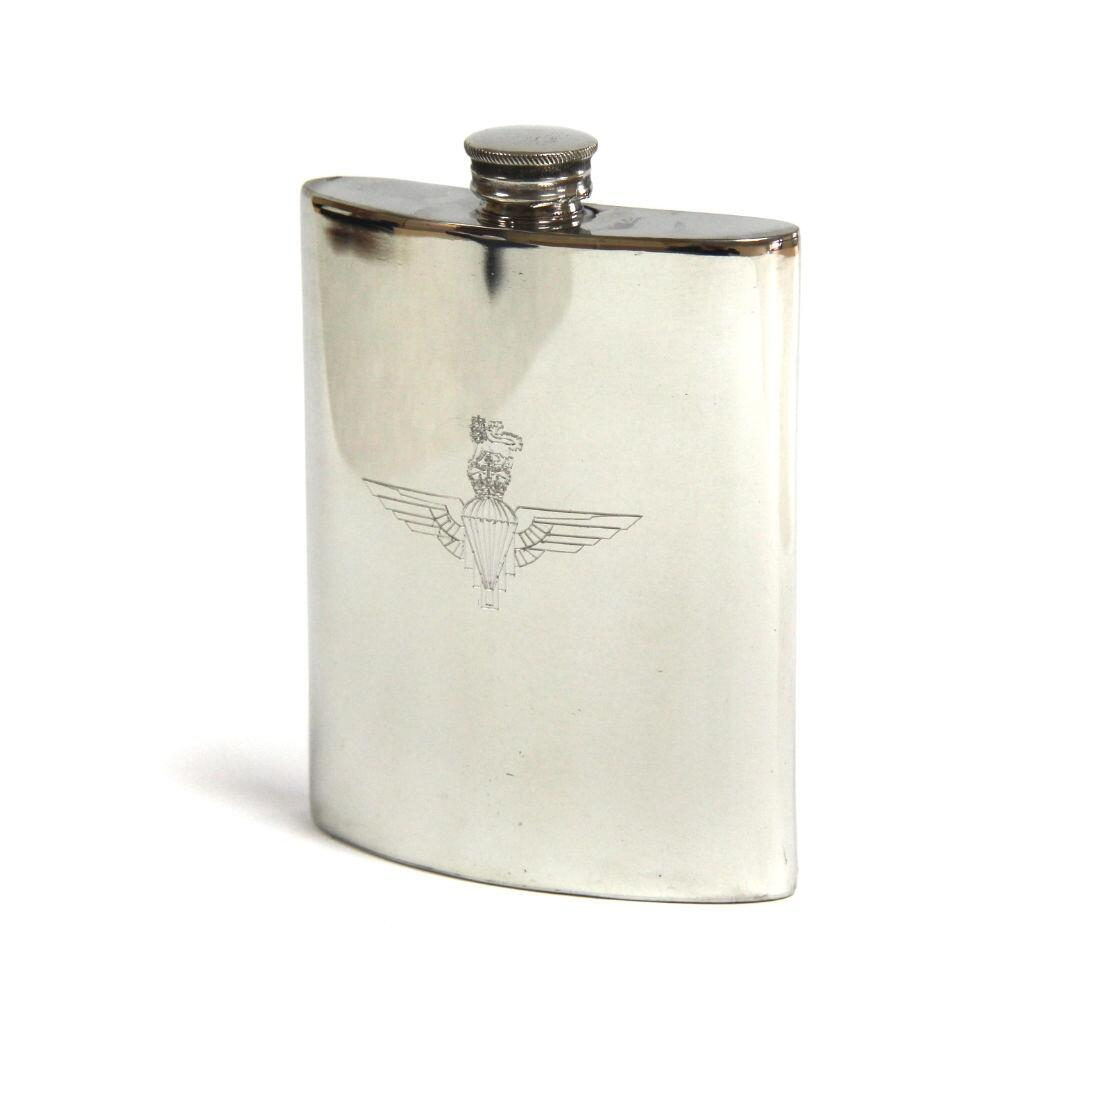 Pewter Hip Flask, Engraved - Parachute Regiment